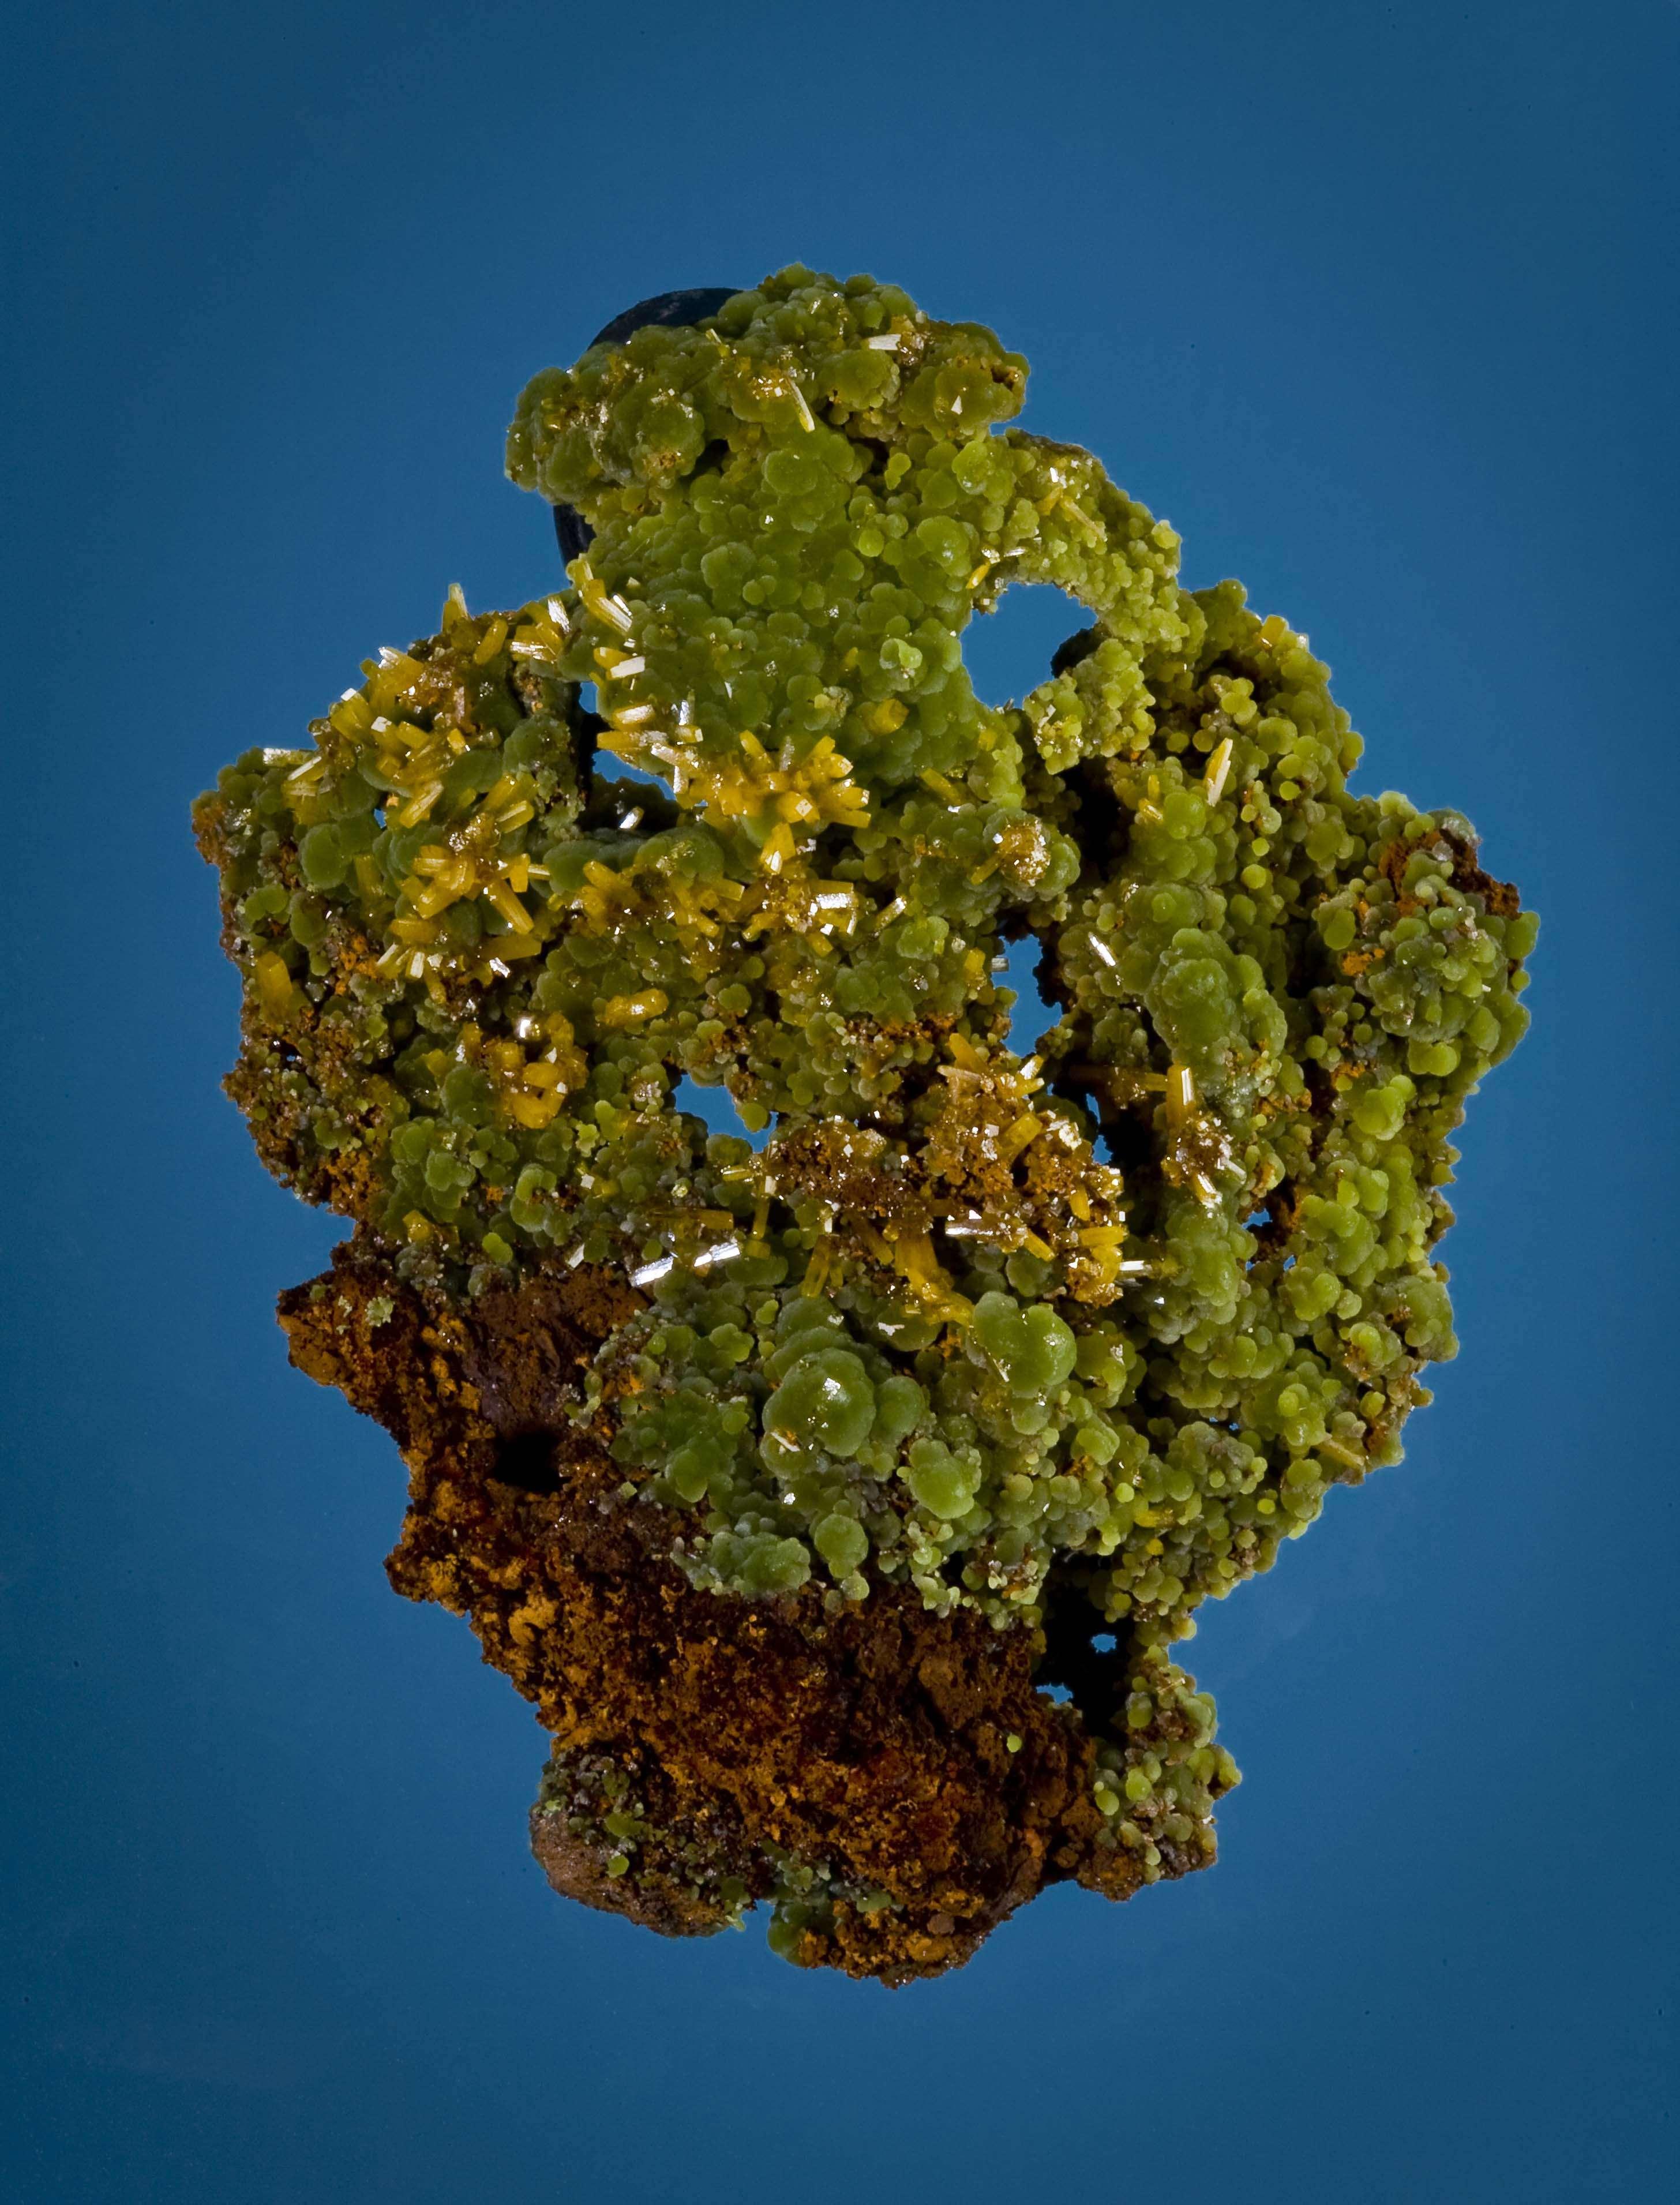 An elegant lightweight limonite matrix host spheres beautifully